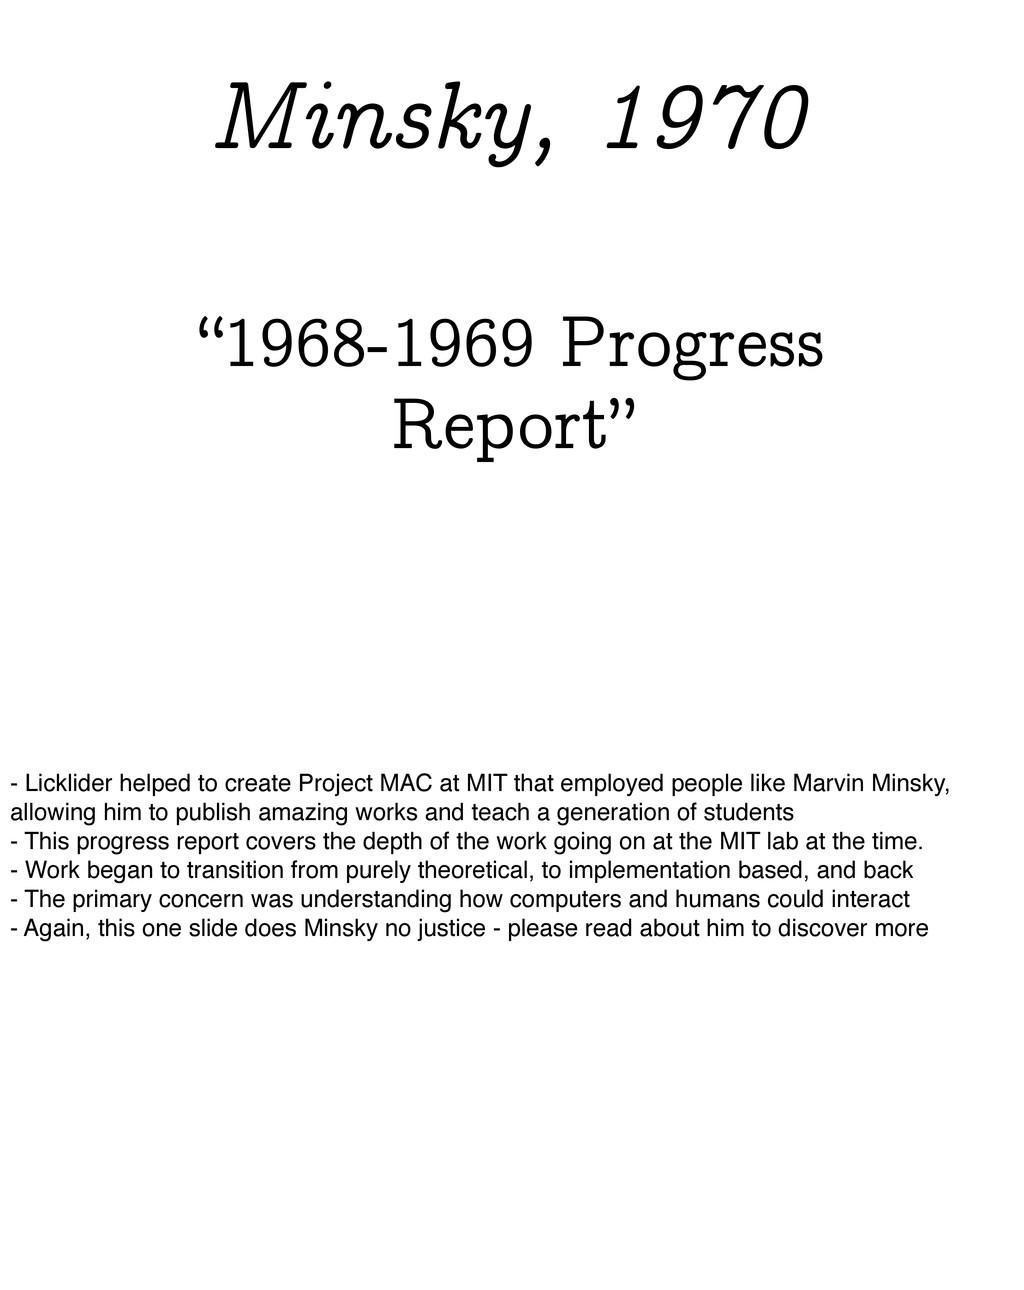 """1968-1969 Progress Report"" Minsky, 1970 - Lick..."